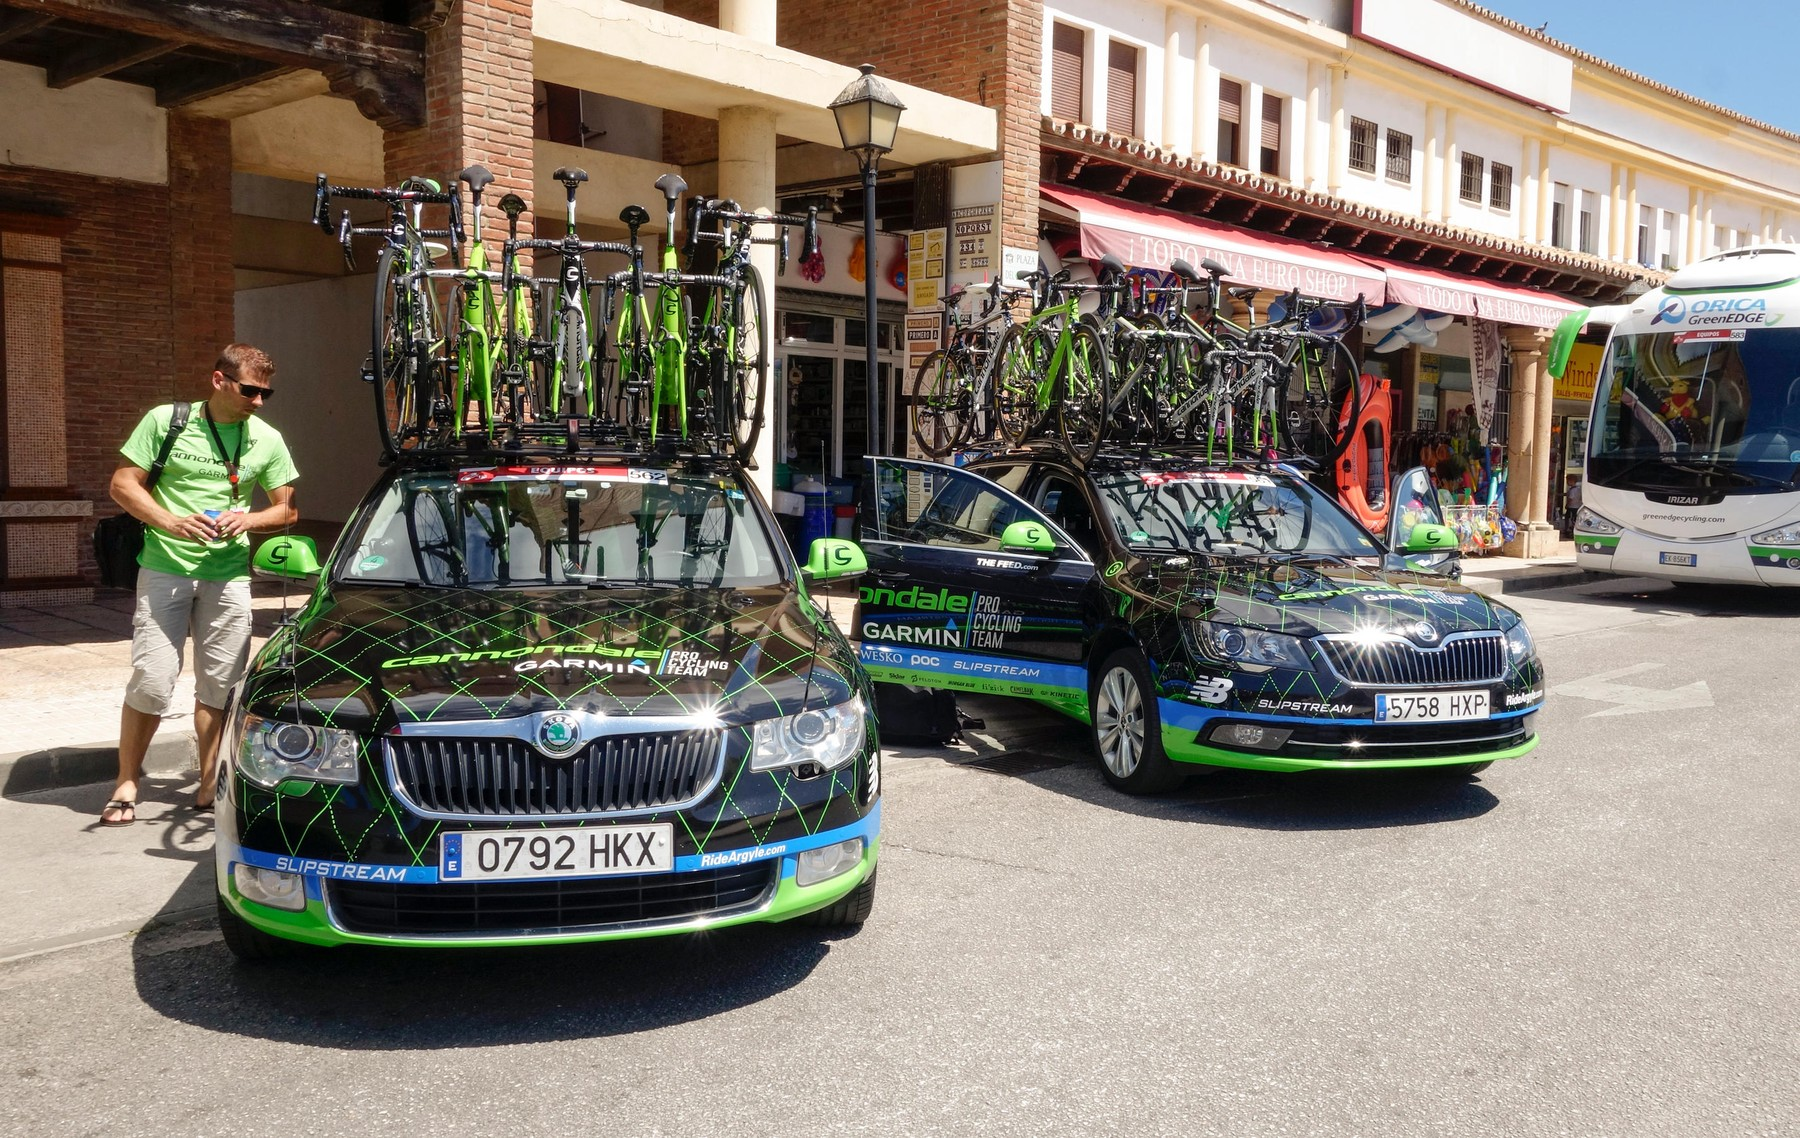 Broom wagons of Cannondale-Garmin Pro Cycling Team. At La cala de Mijas.